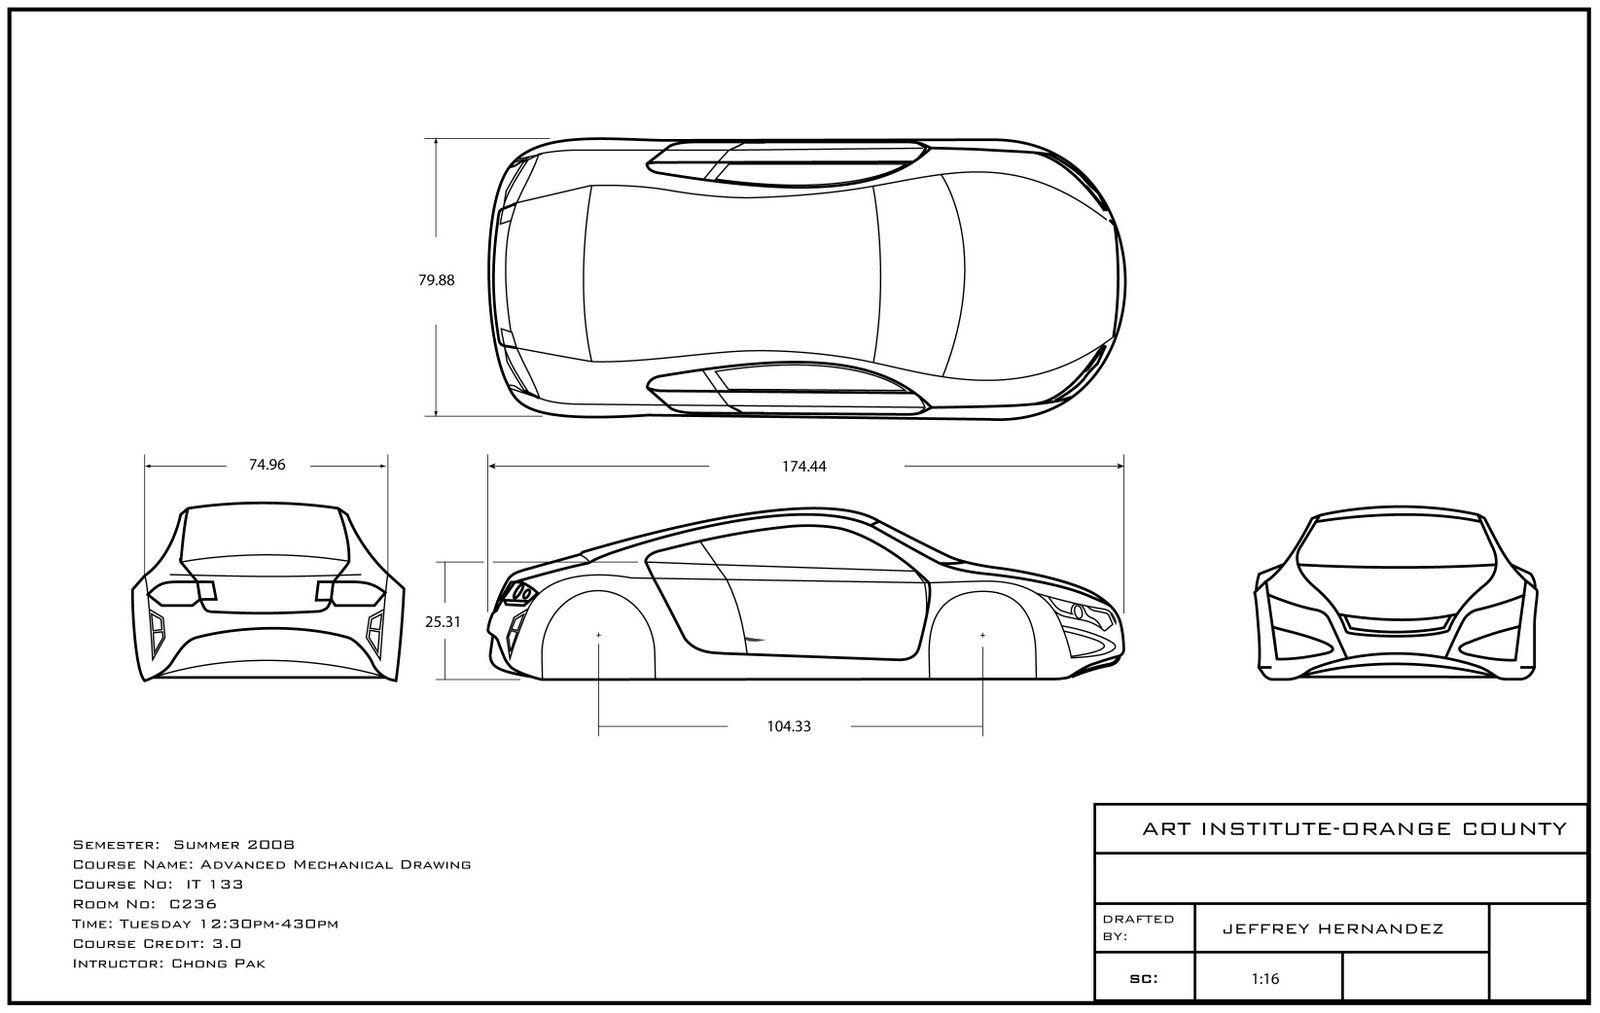 Dibujo Técnico Ejercicios CarDibujo De Orthographic dxrCeWoB